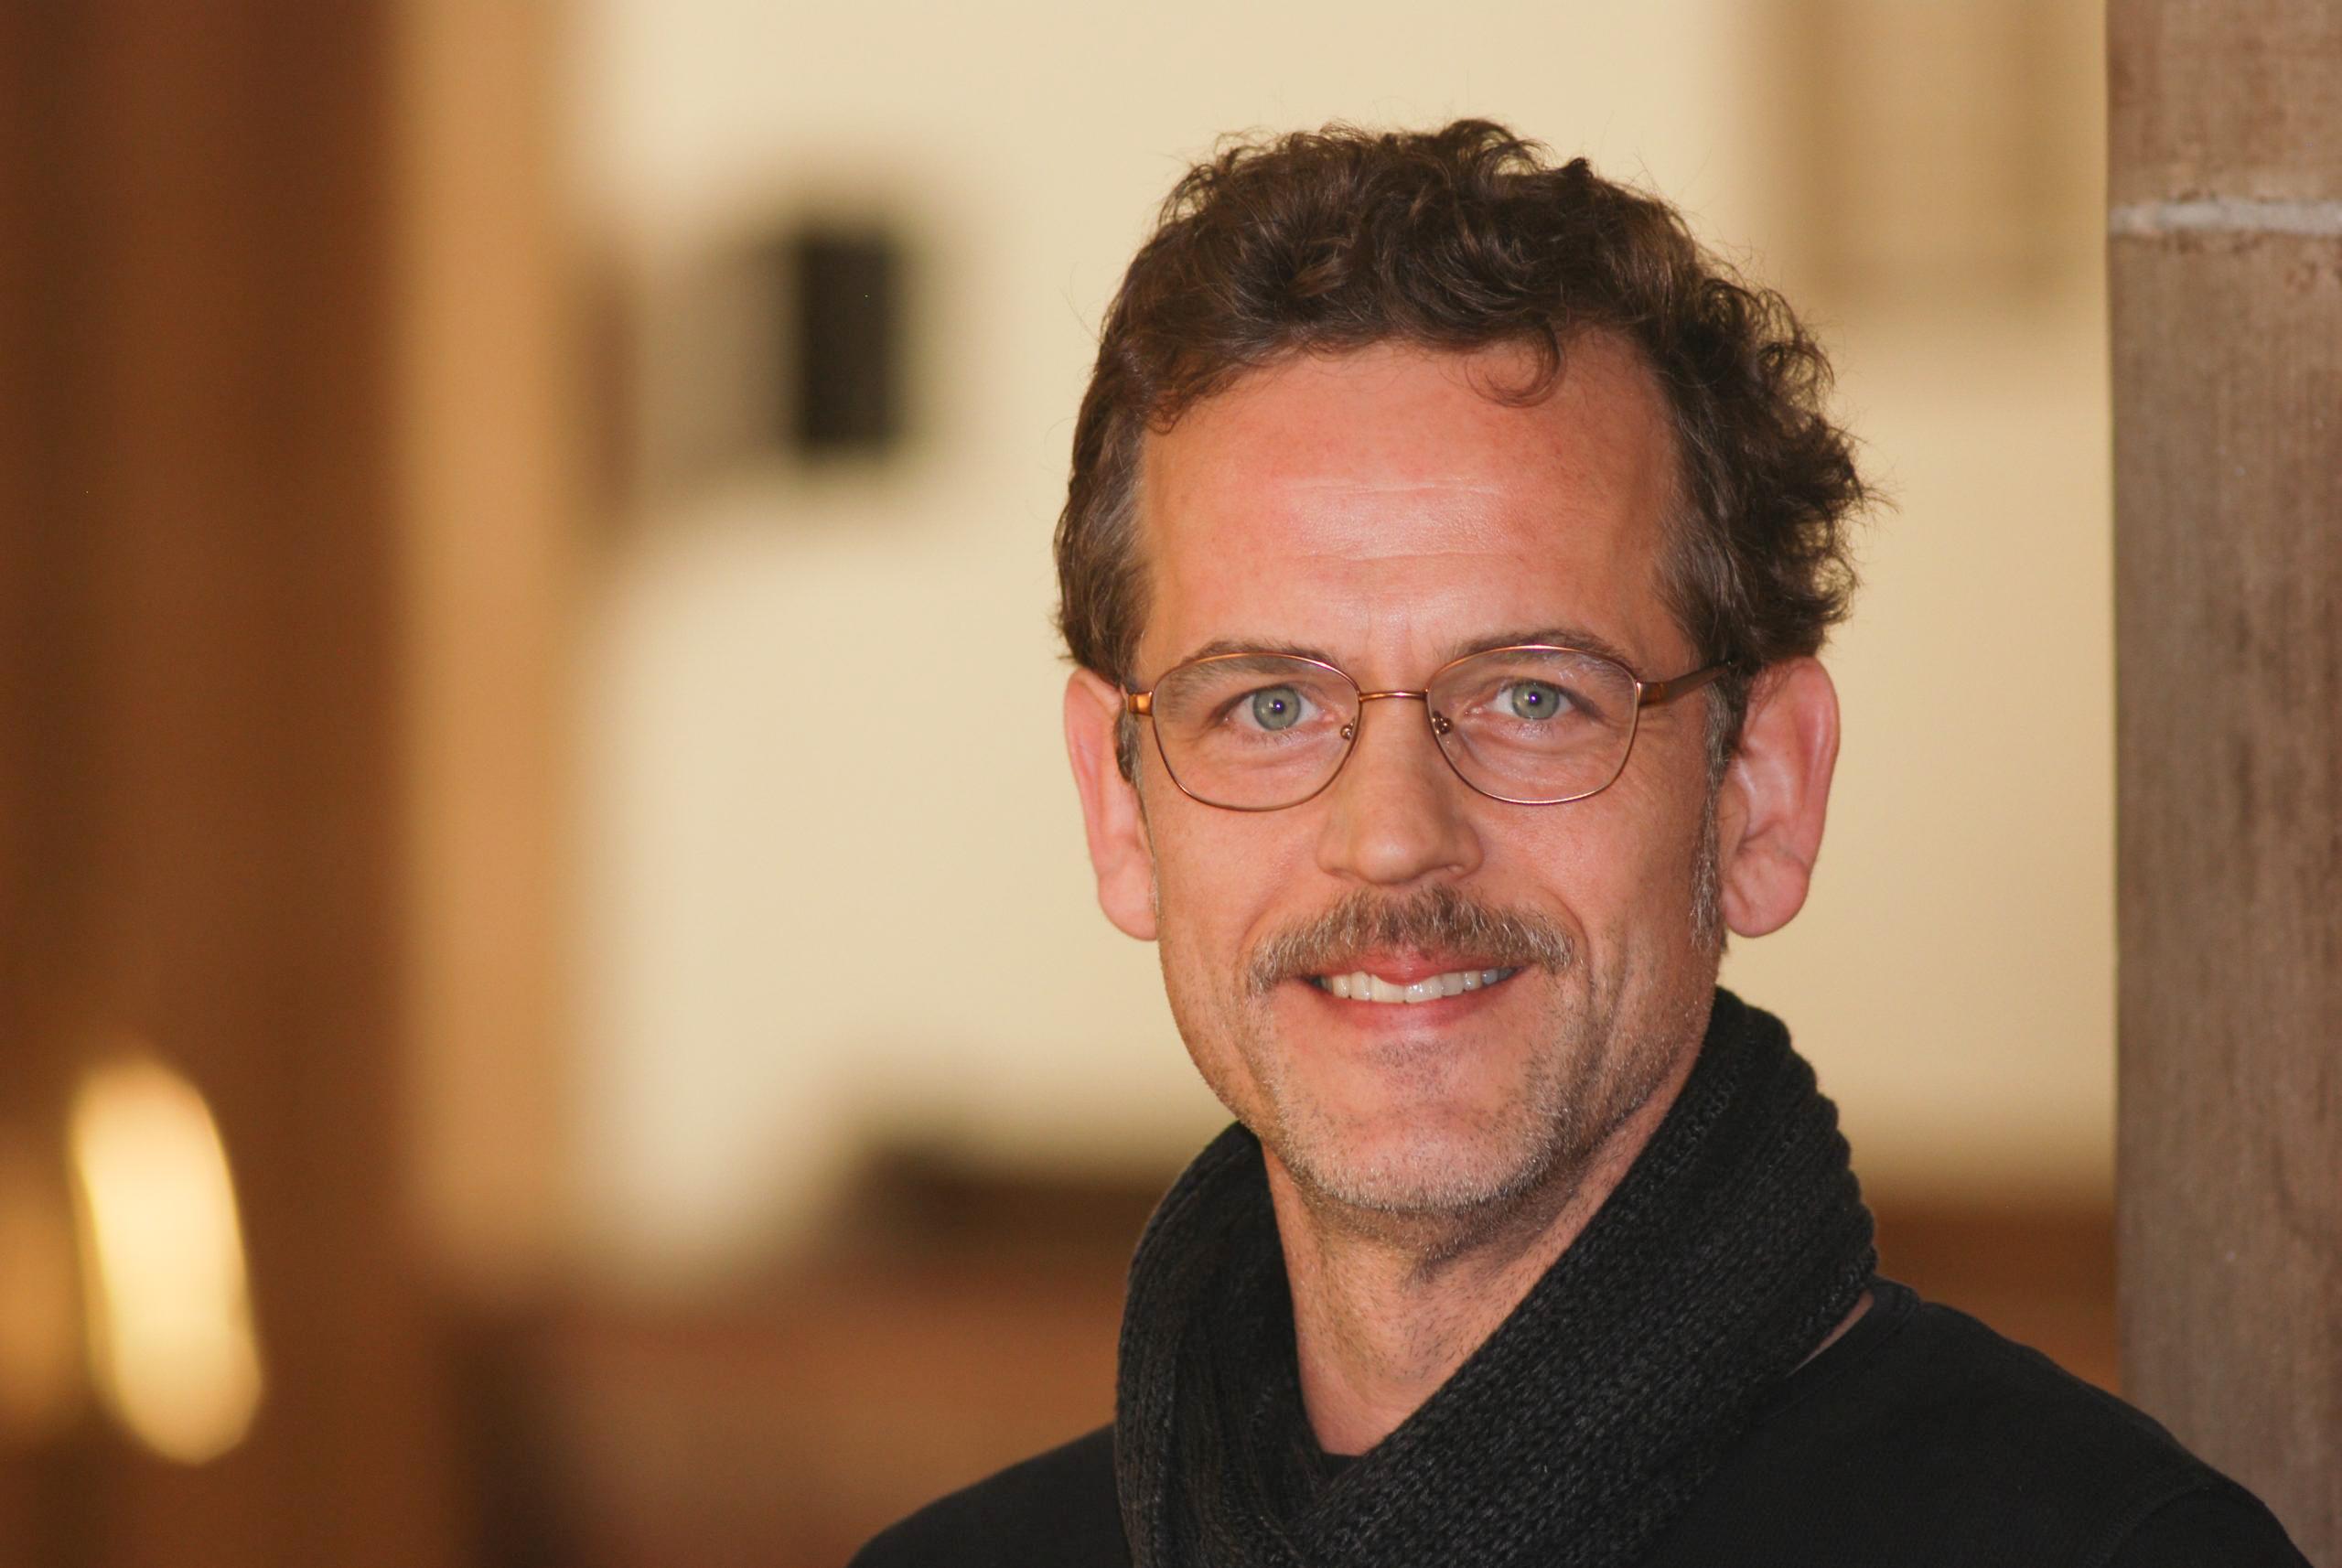 Alexander Teichmann